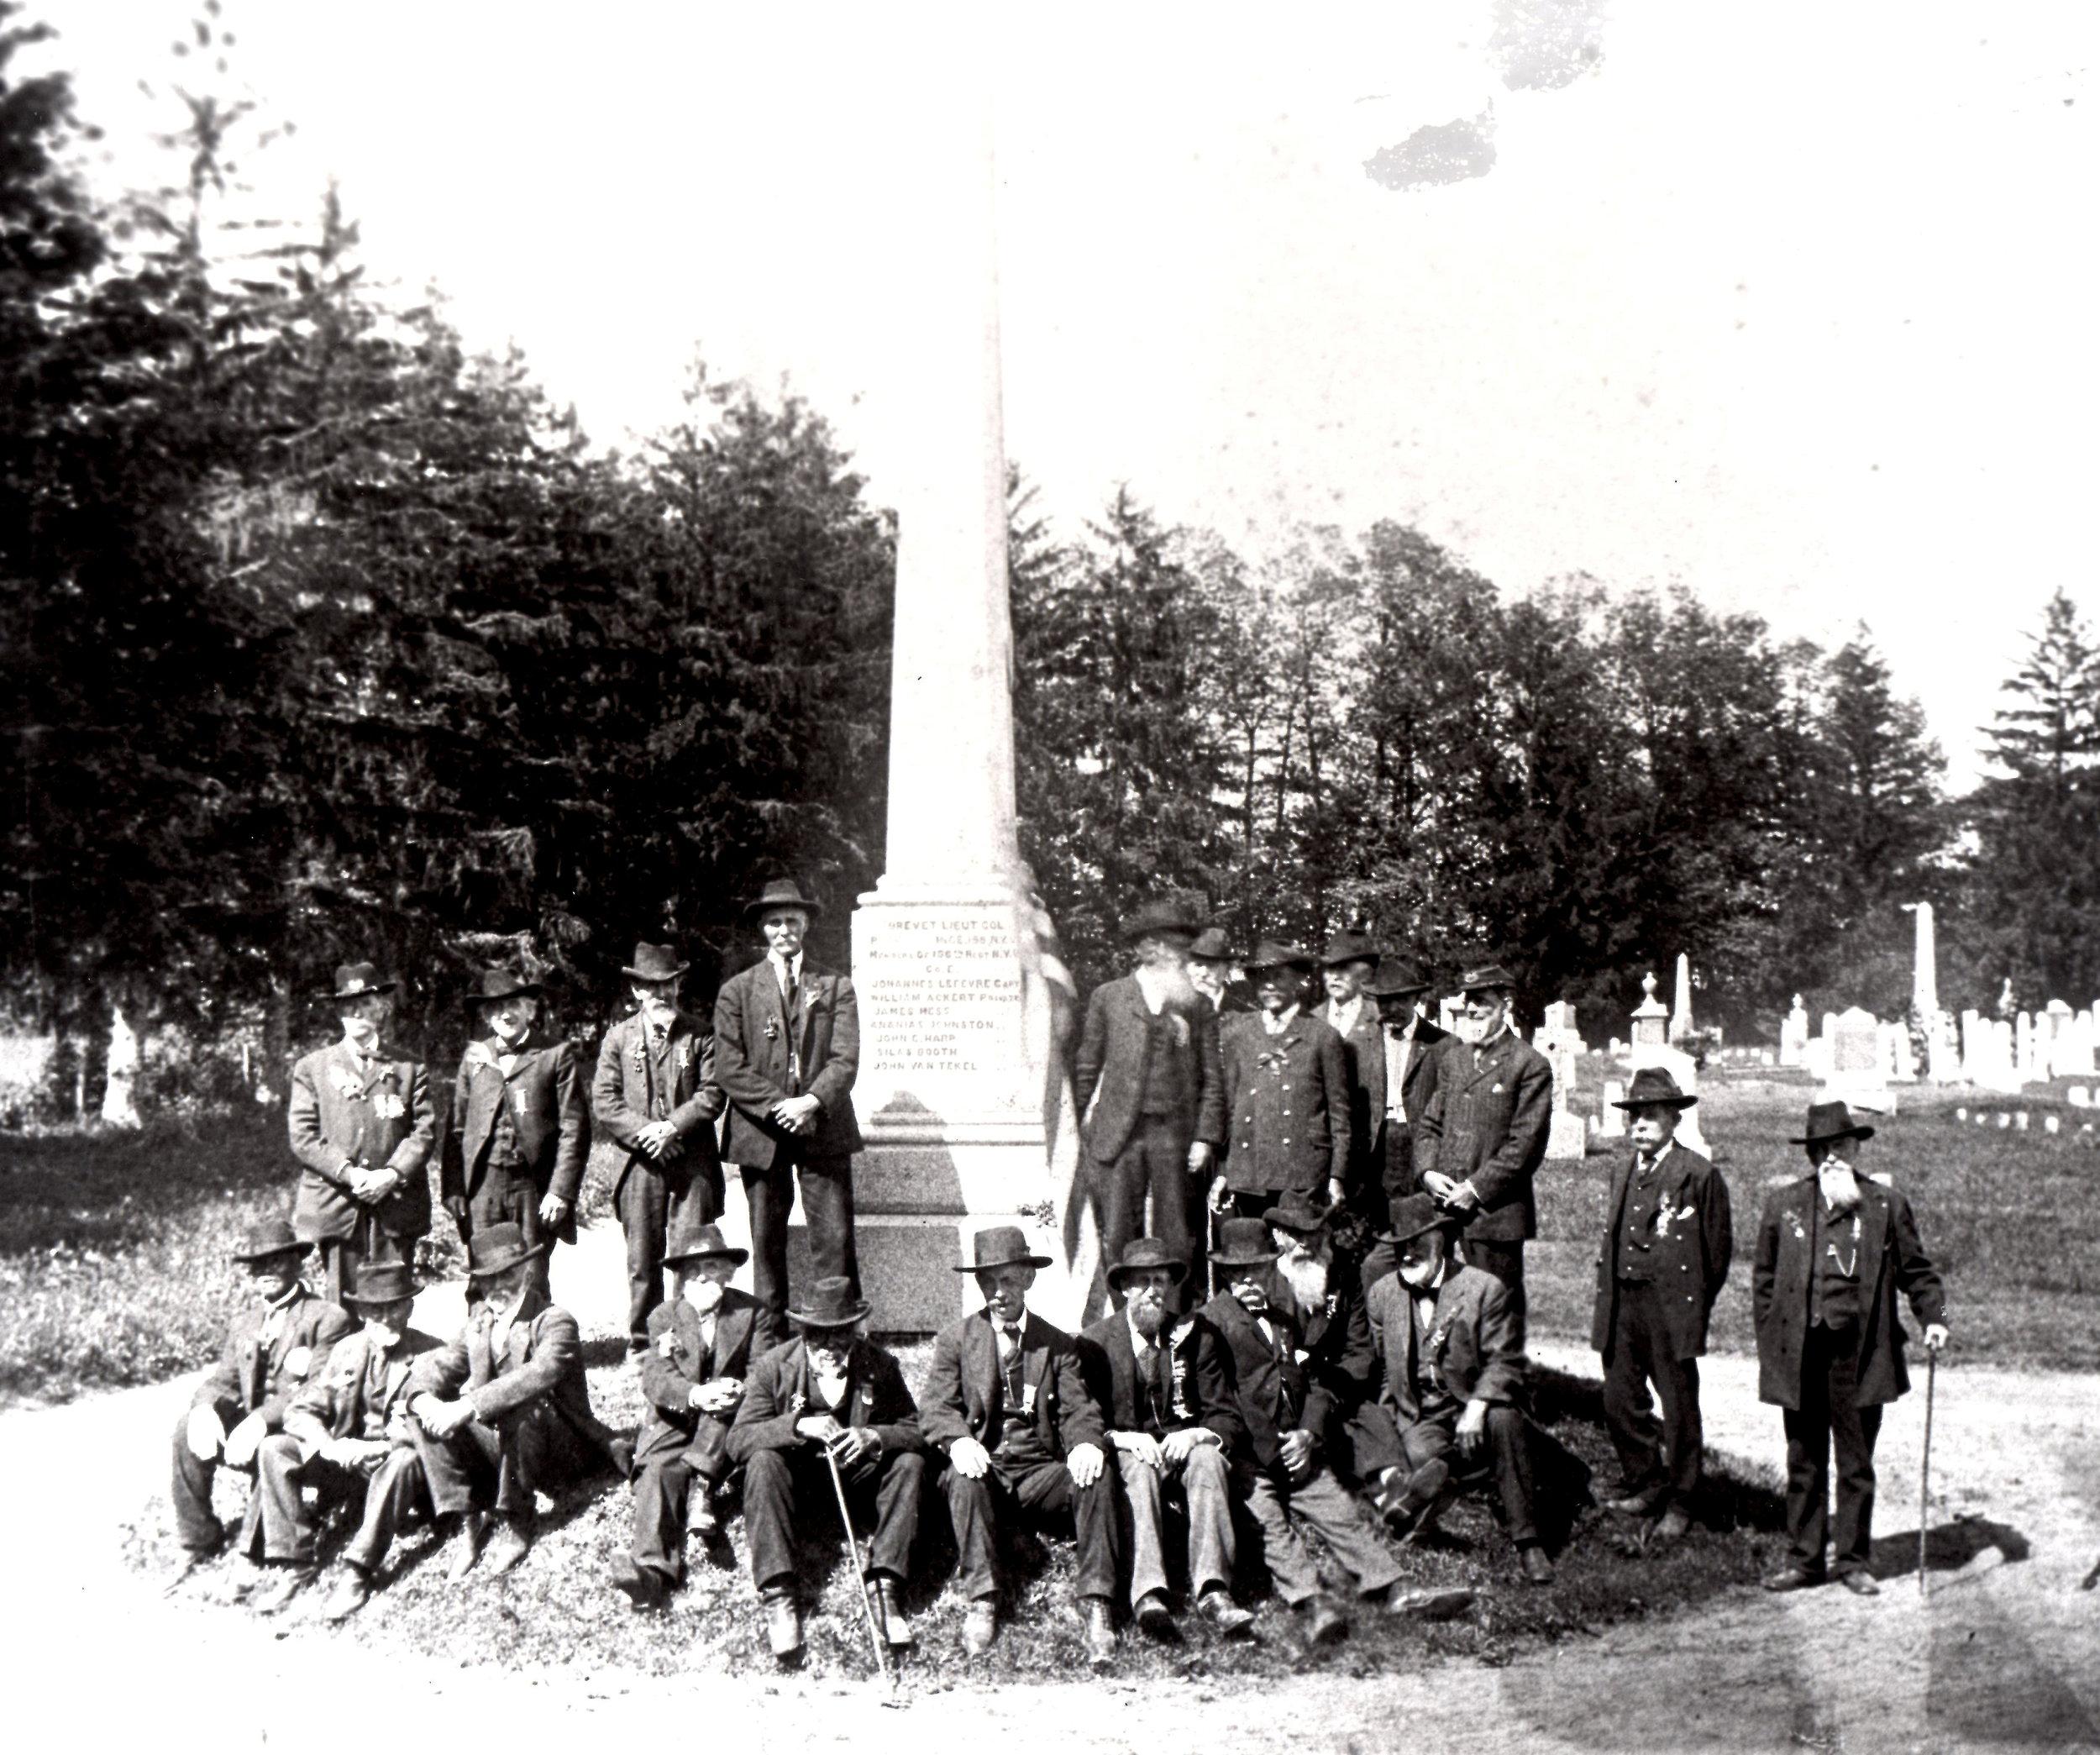 HHHC-Jacob W with GAR at NP Rural Cemetery.jpg